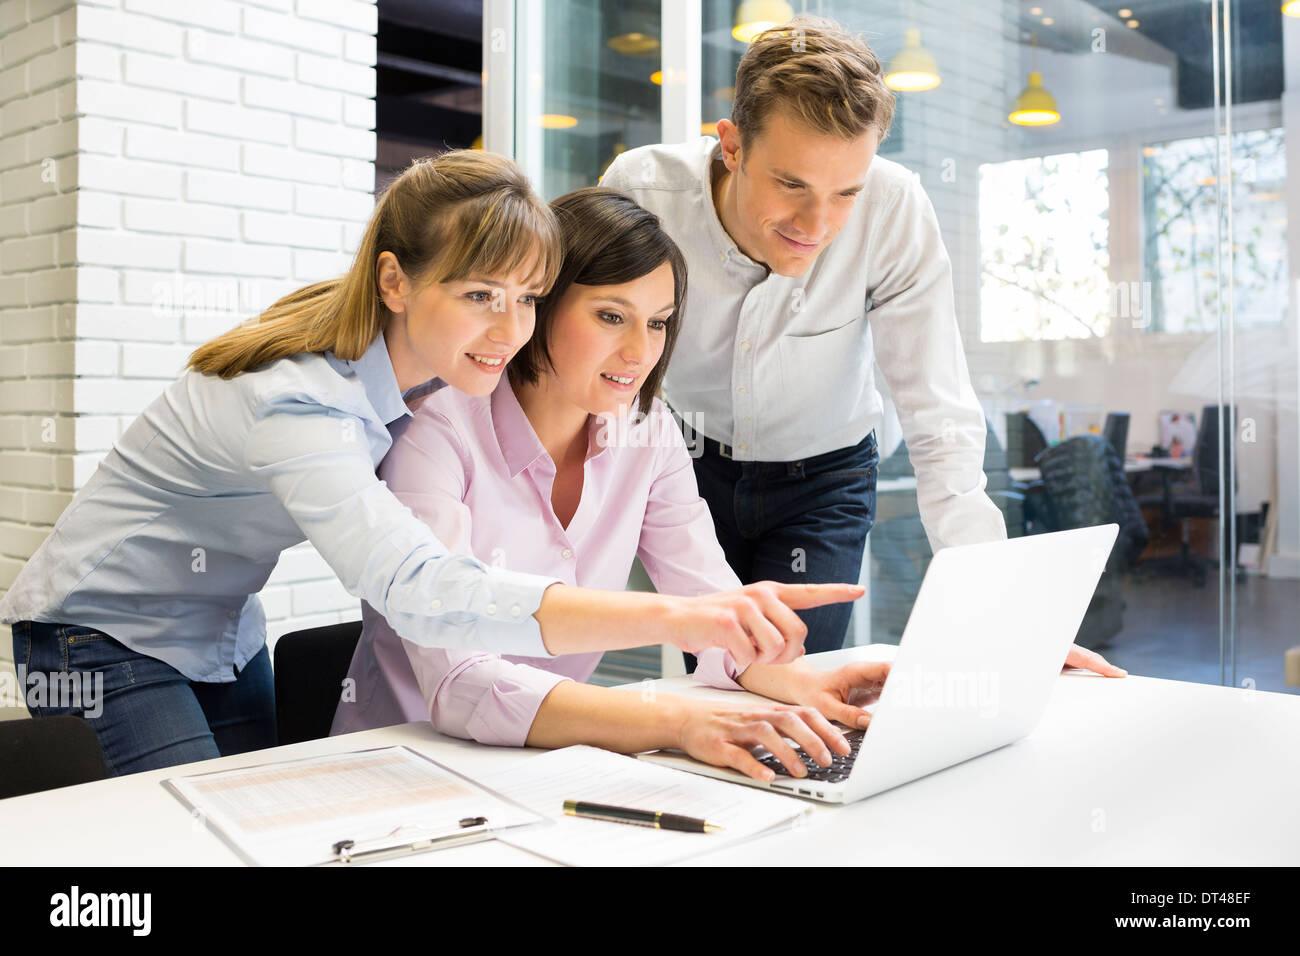 Business donna uomo computer desk start-up Immagini Stock